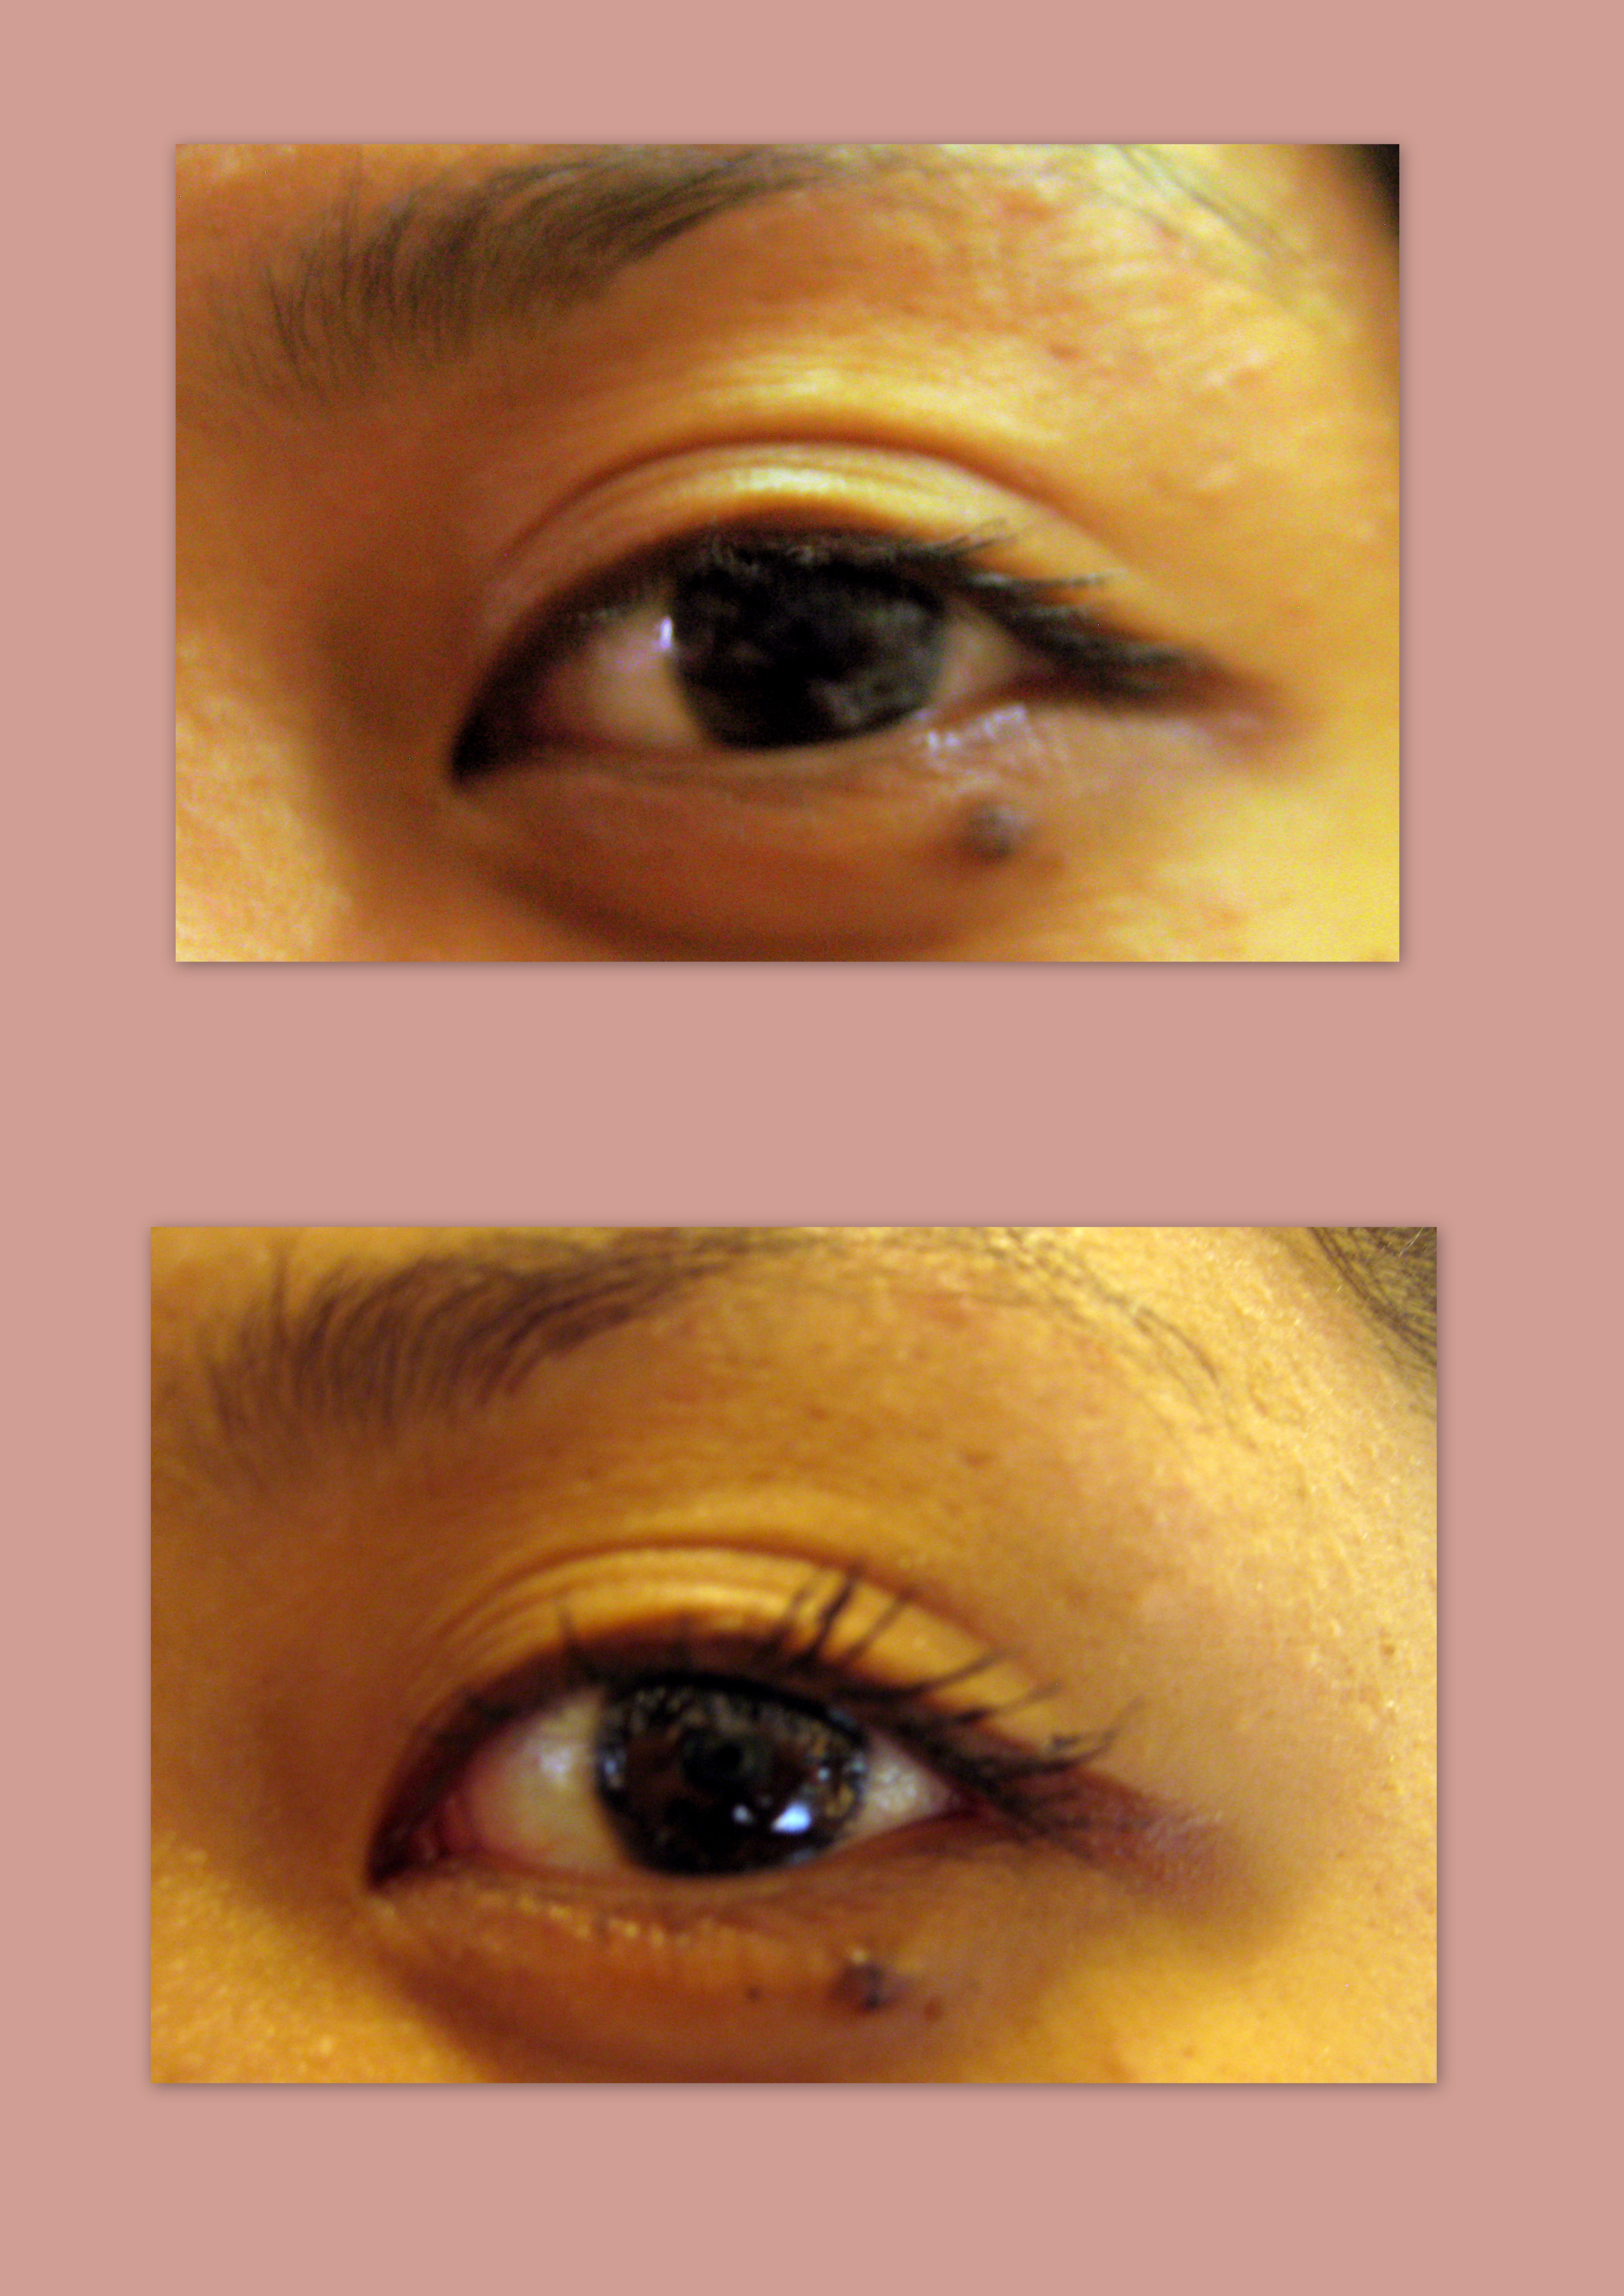 Eye with mascara